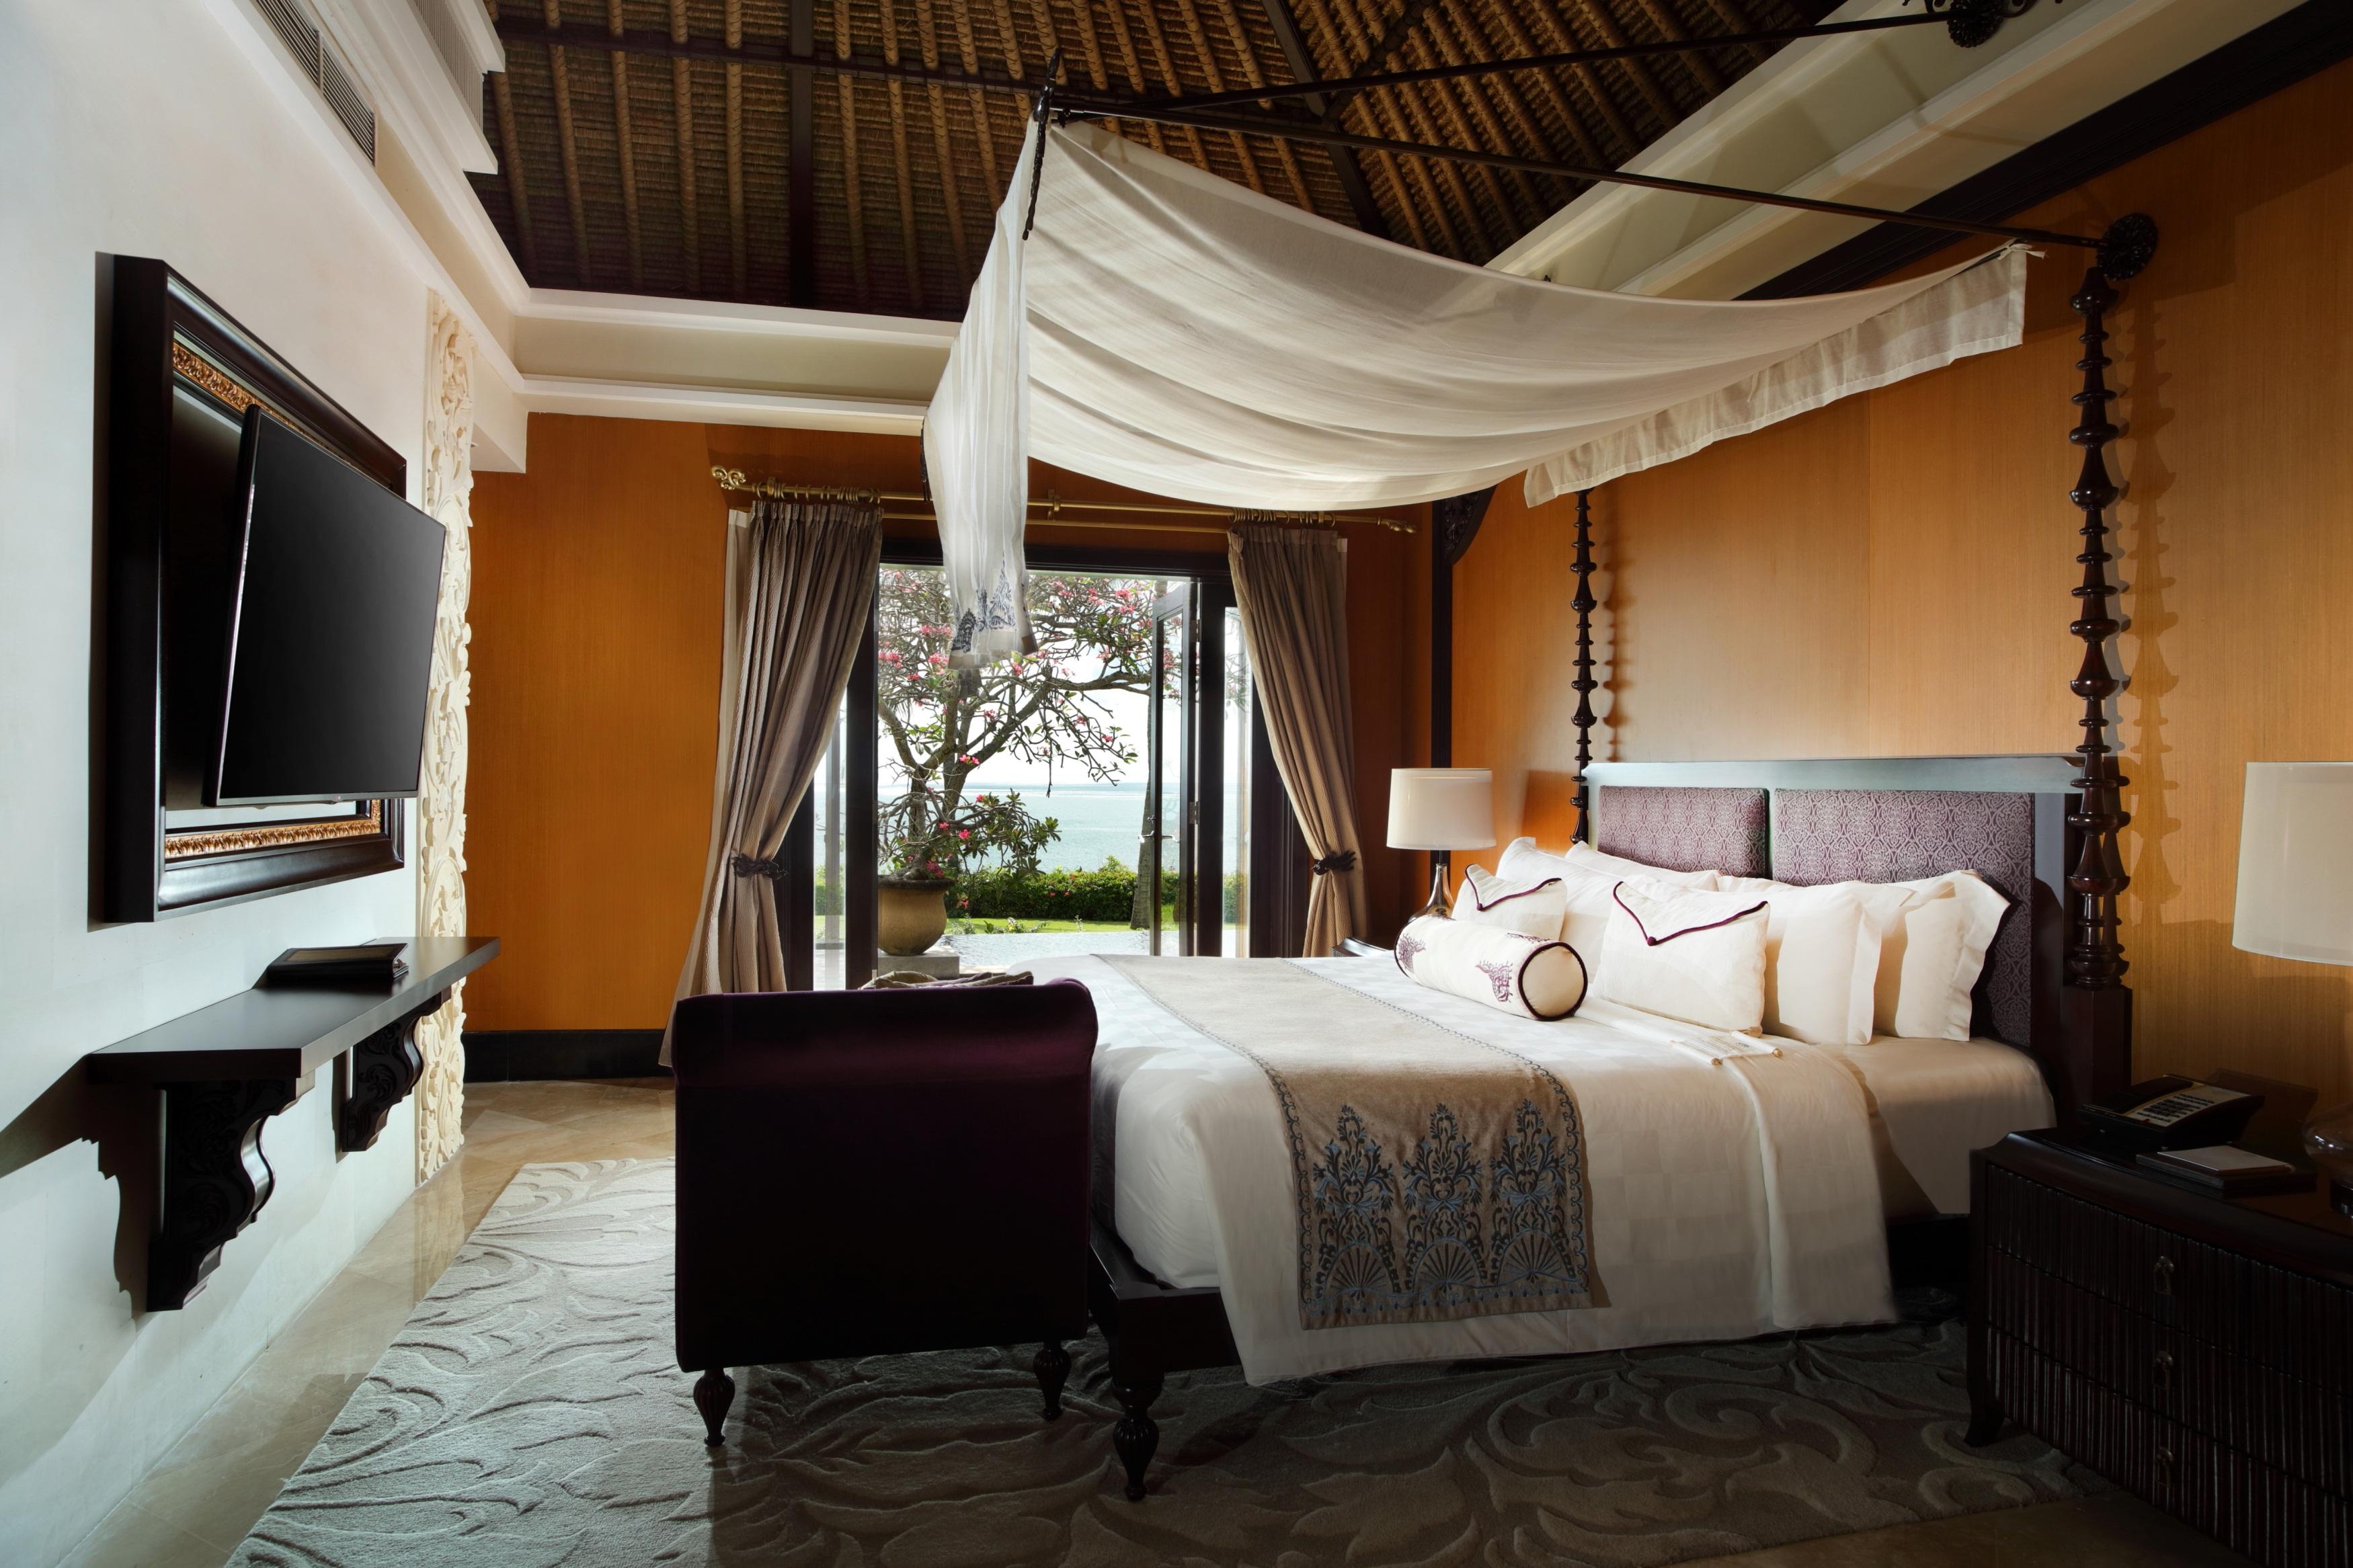 VAY RBW Brochure KAMIKI 2017 One Bedroom Ocean Front Villa - Master Bedroom.jpg